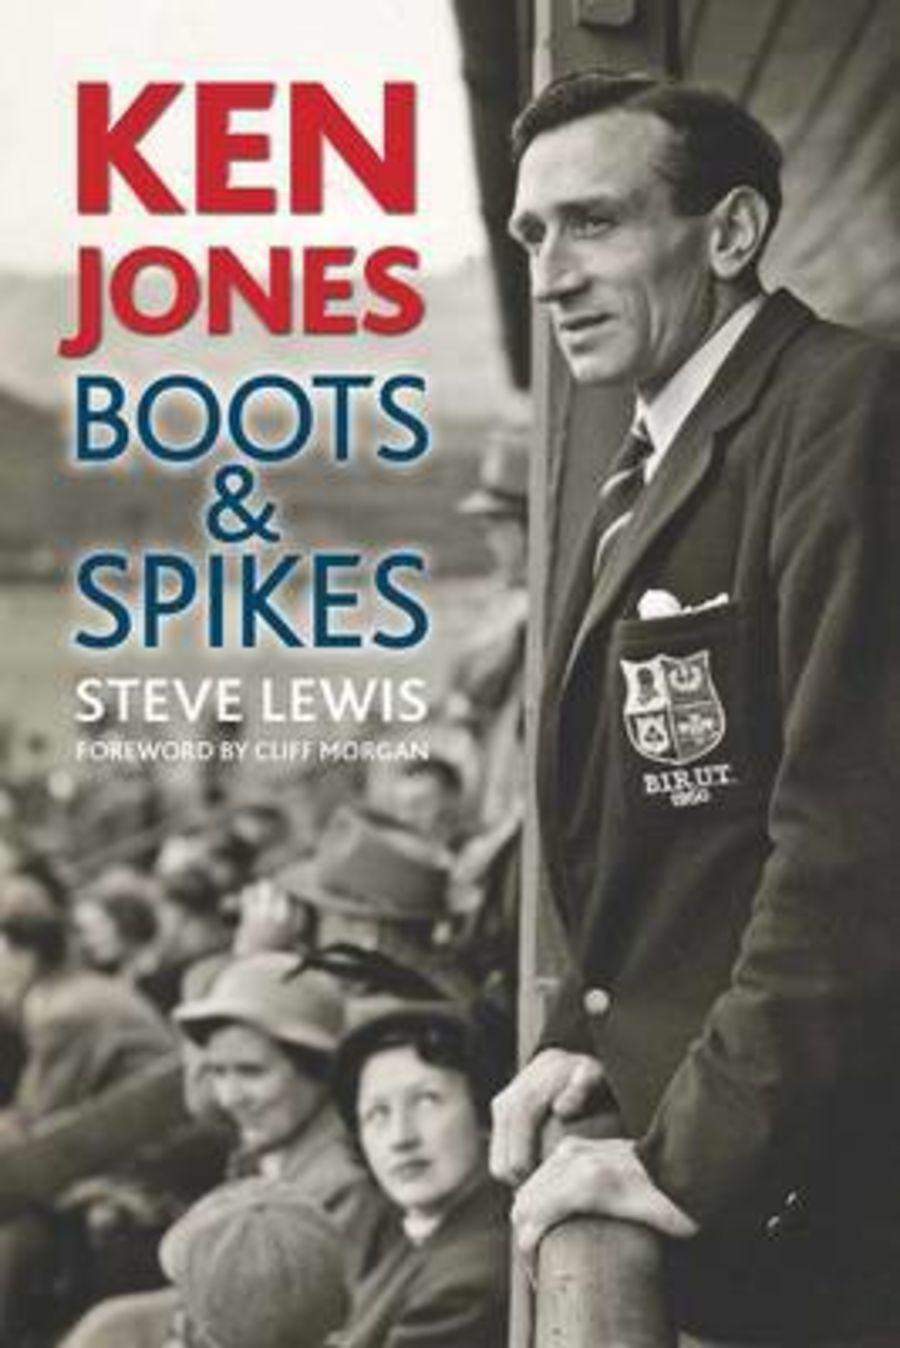 Book - Ken Jones - Boots & Spikes